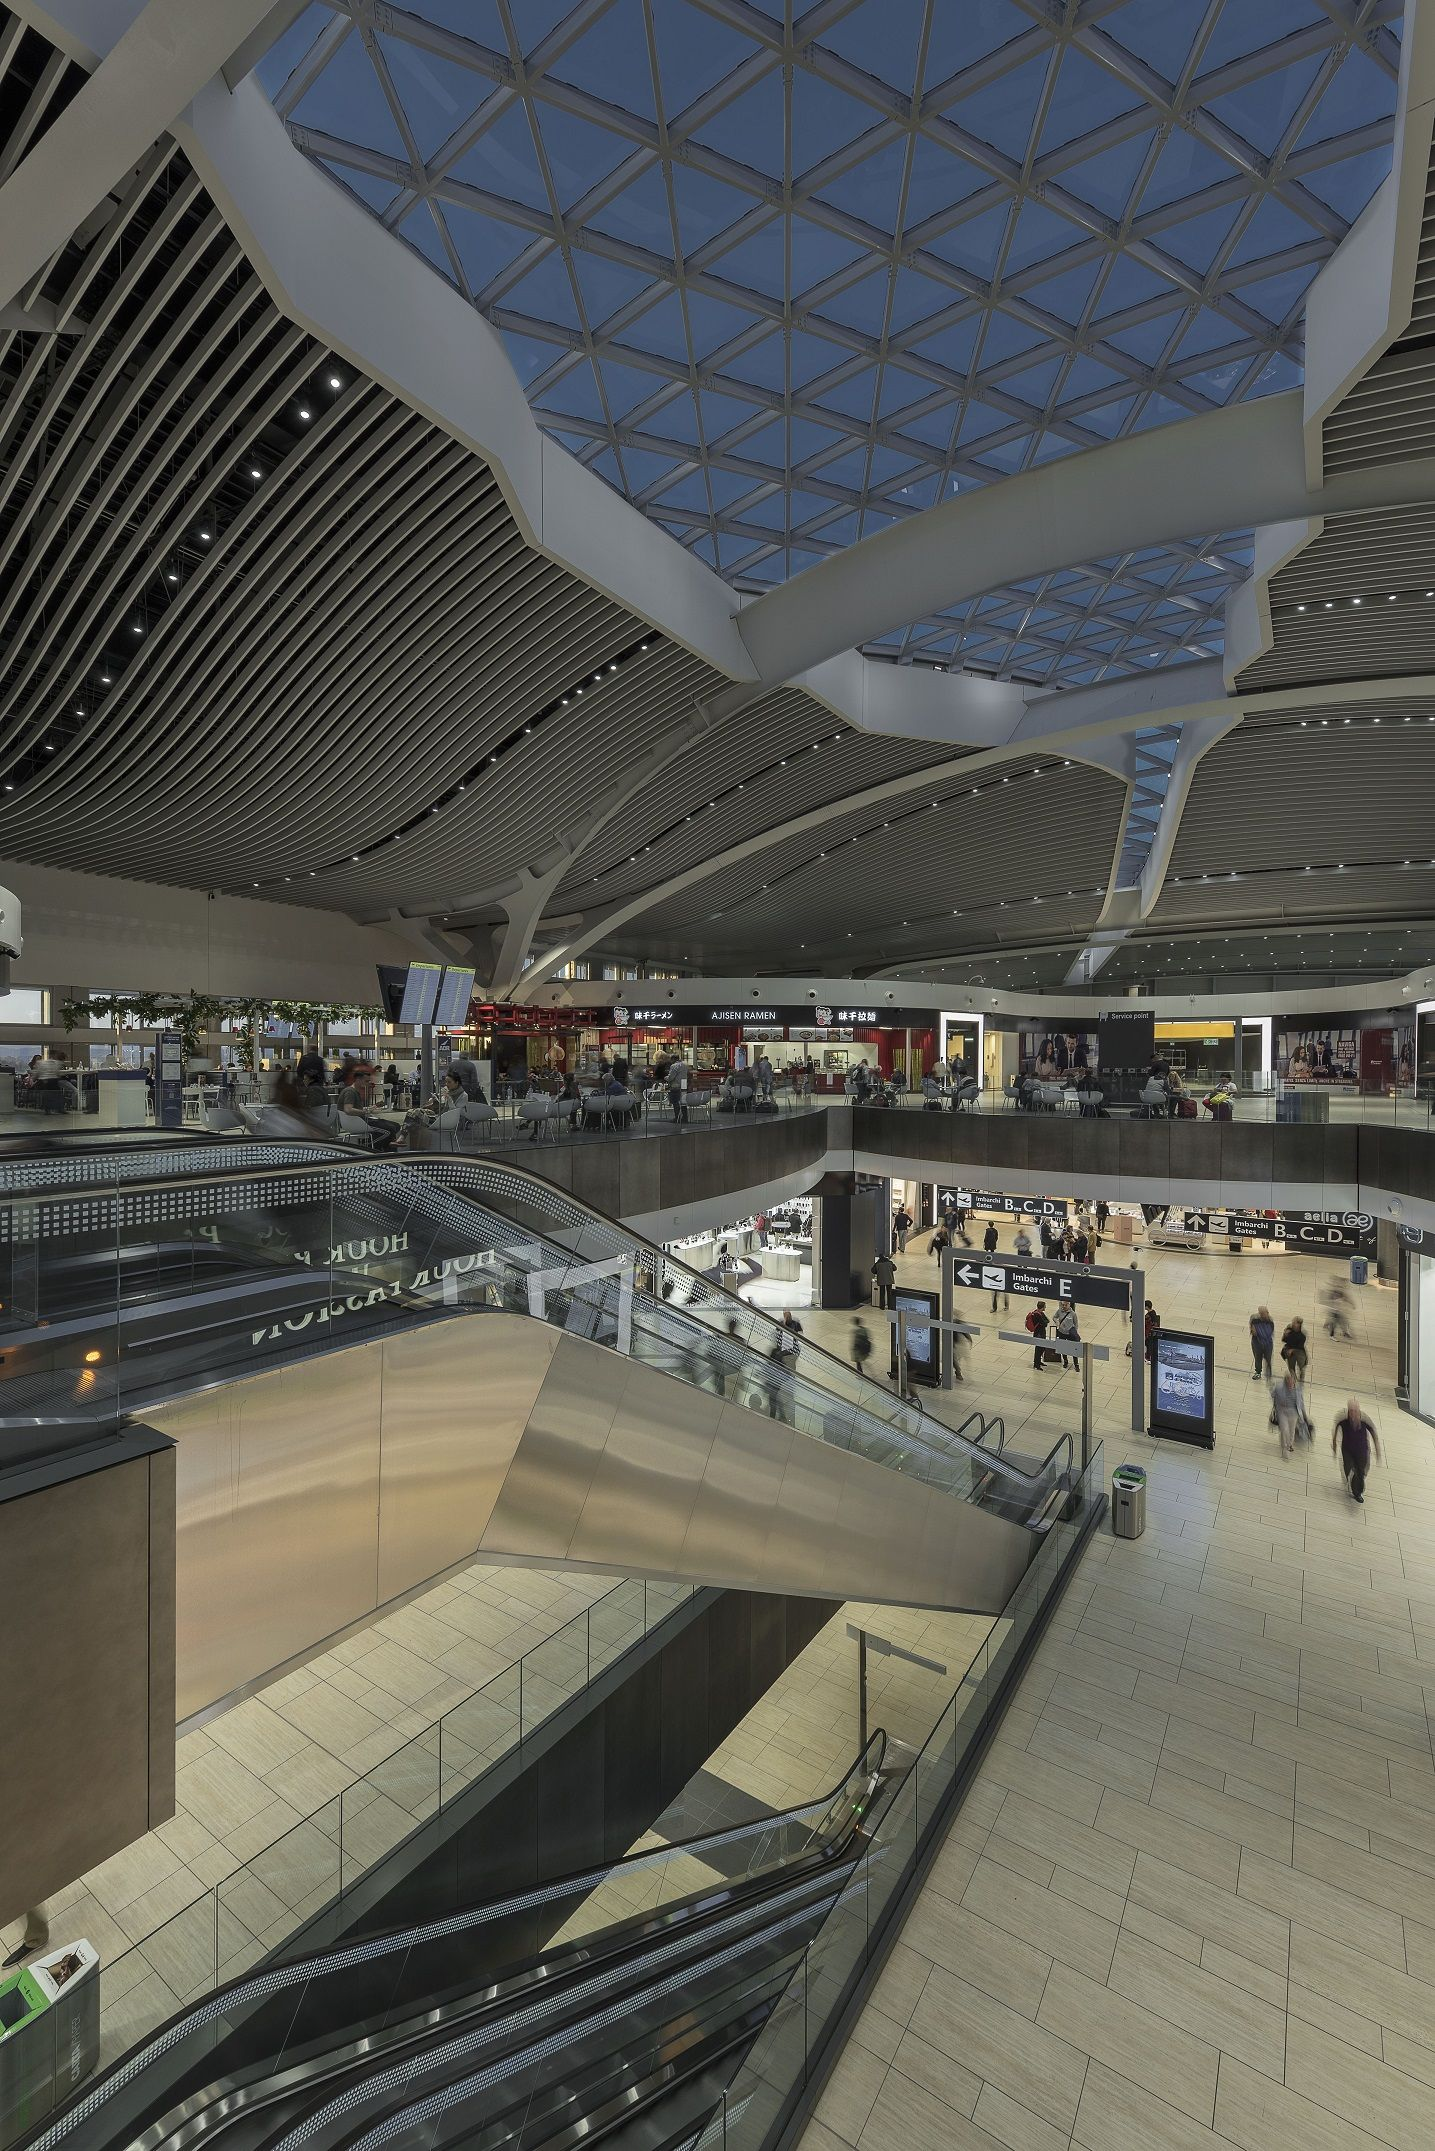 Leonardo Da Vinci Airport Terminal - Fiumicino Rome